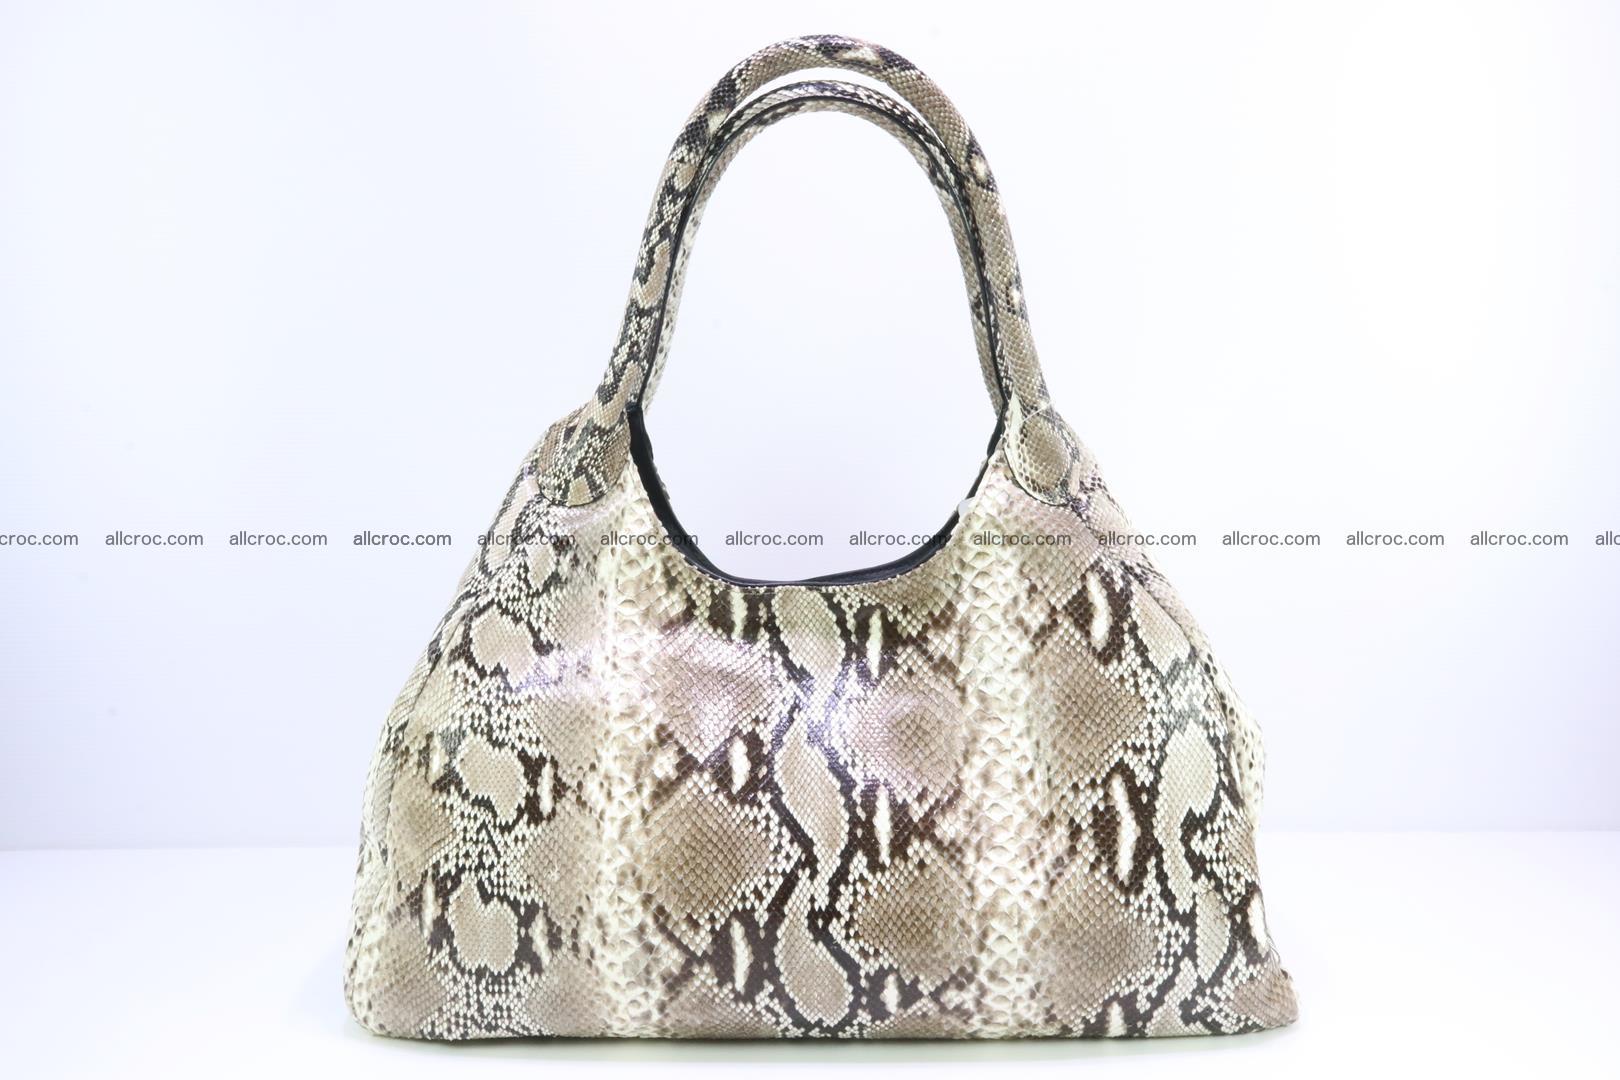 Python skin handbag for lady from genuine Python skin 197 Foto 0